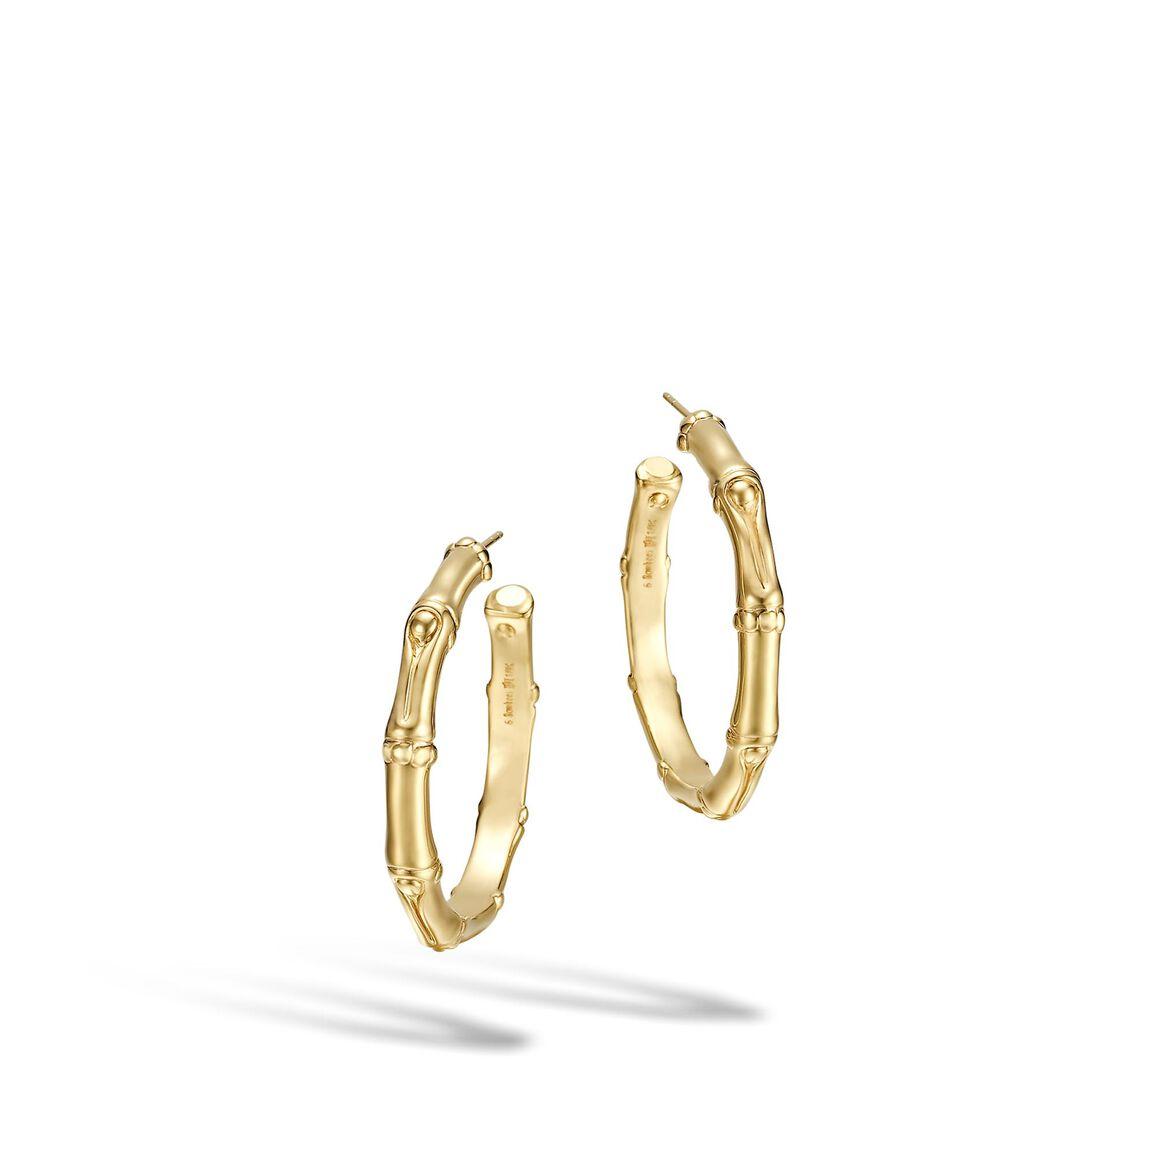 Bamboo Medium Hoop Earring in 18K Gold